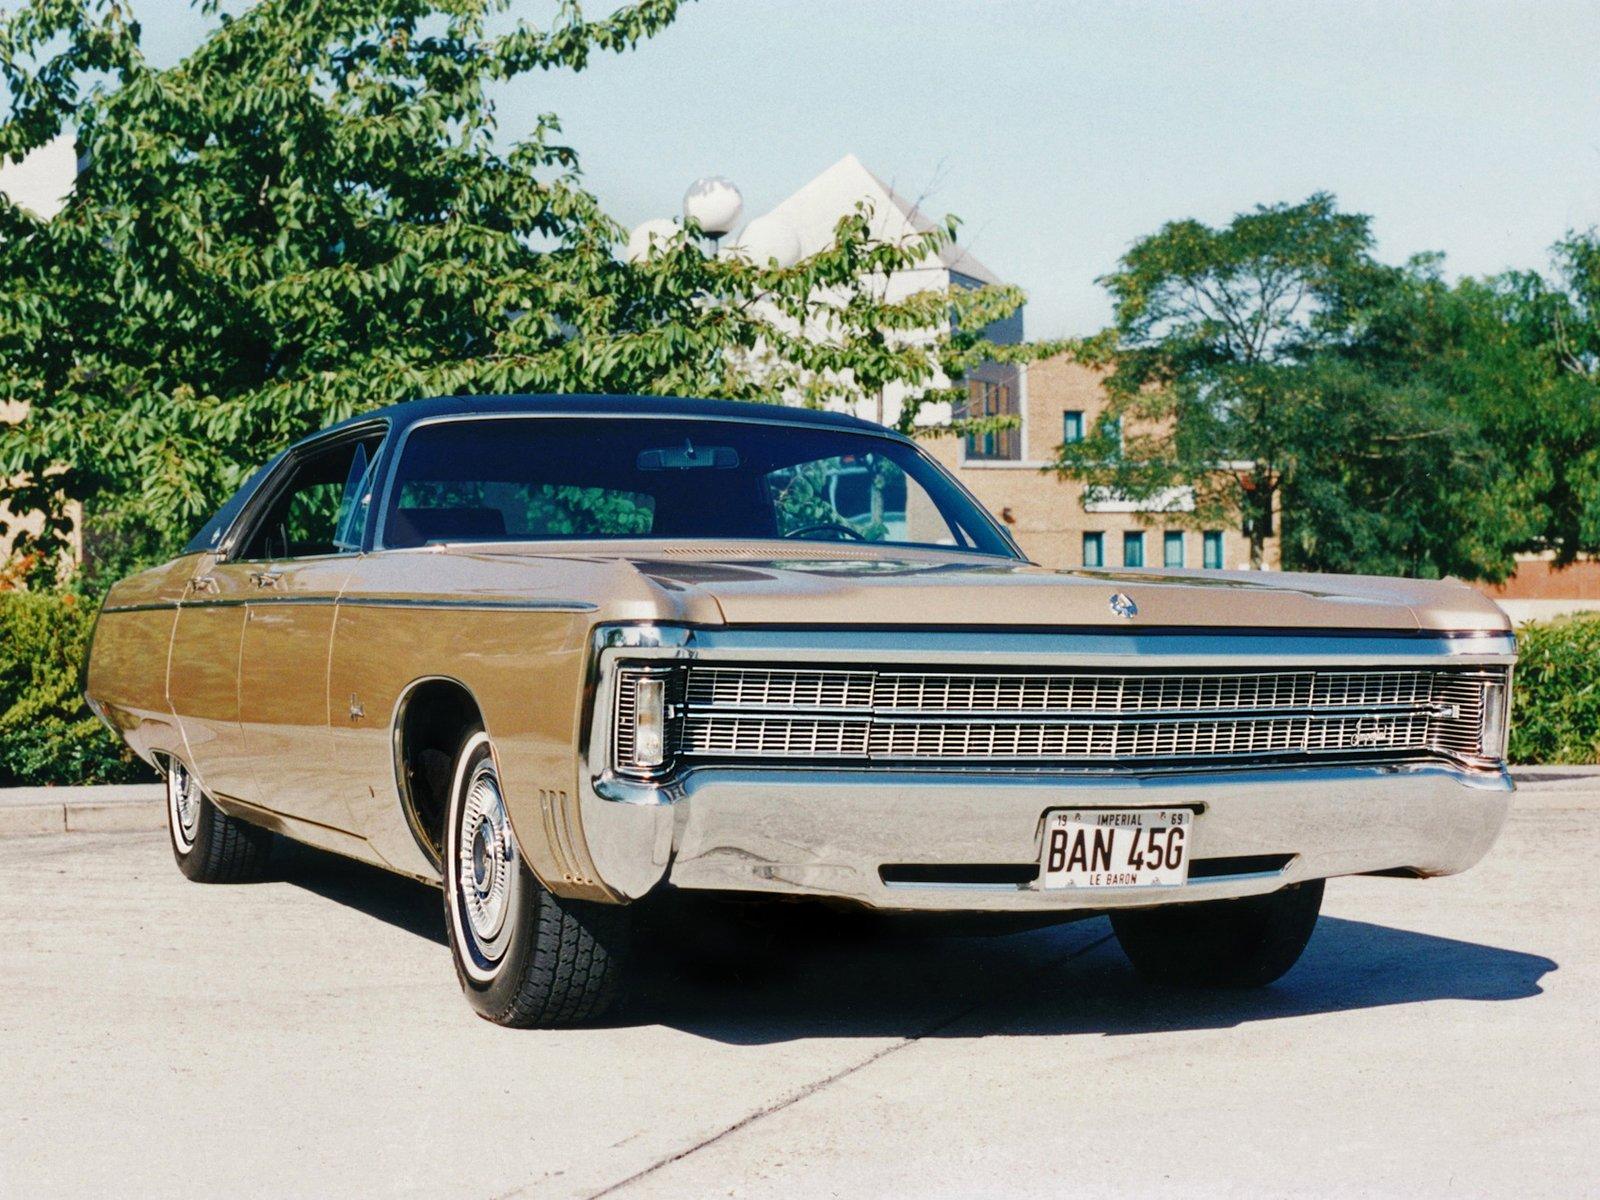 1969 Chrysler Imperial Lebaron 4 Door Hardtop Ey Hym43